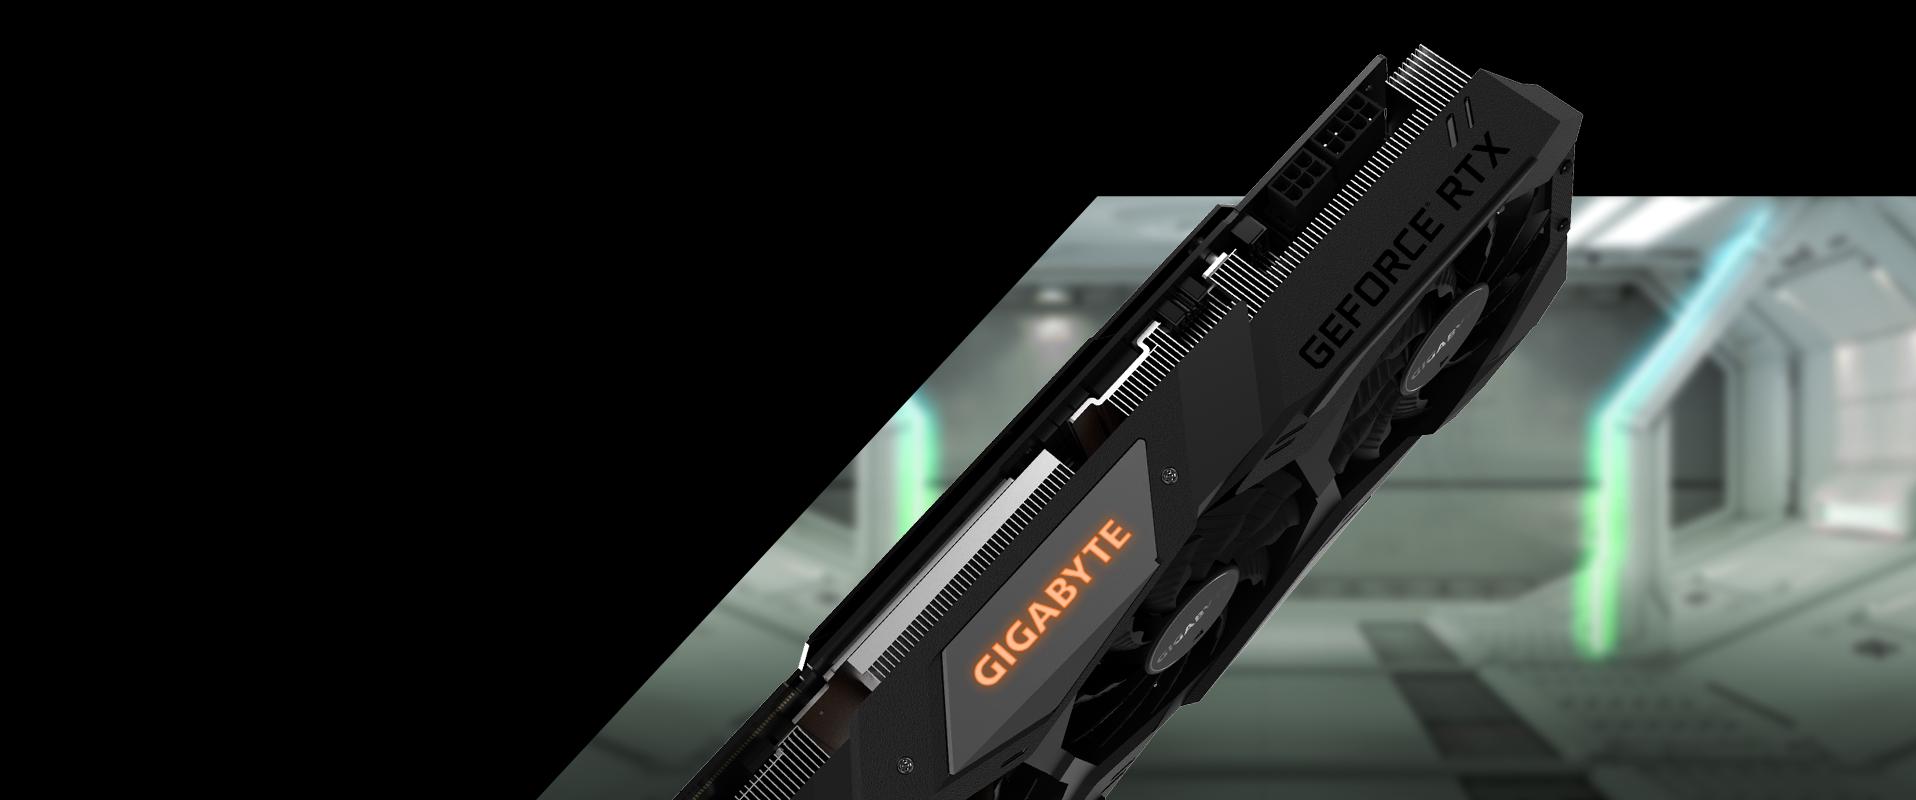 GeForce RTX™ 2080 GAMING OC 8G | Graphics Card - GIGABYTE U S A